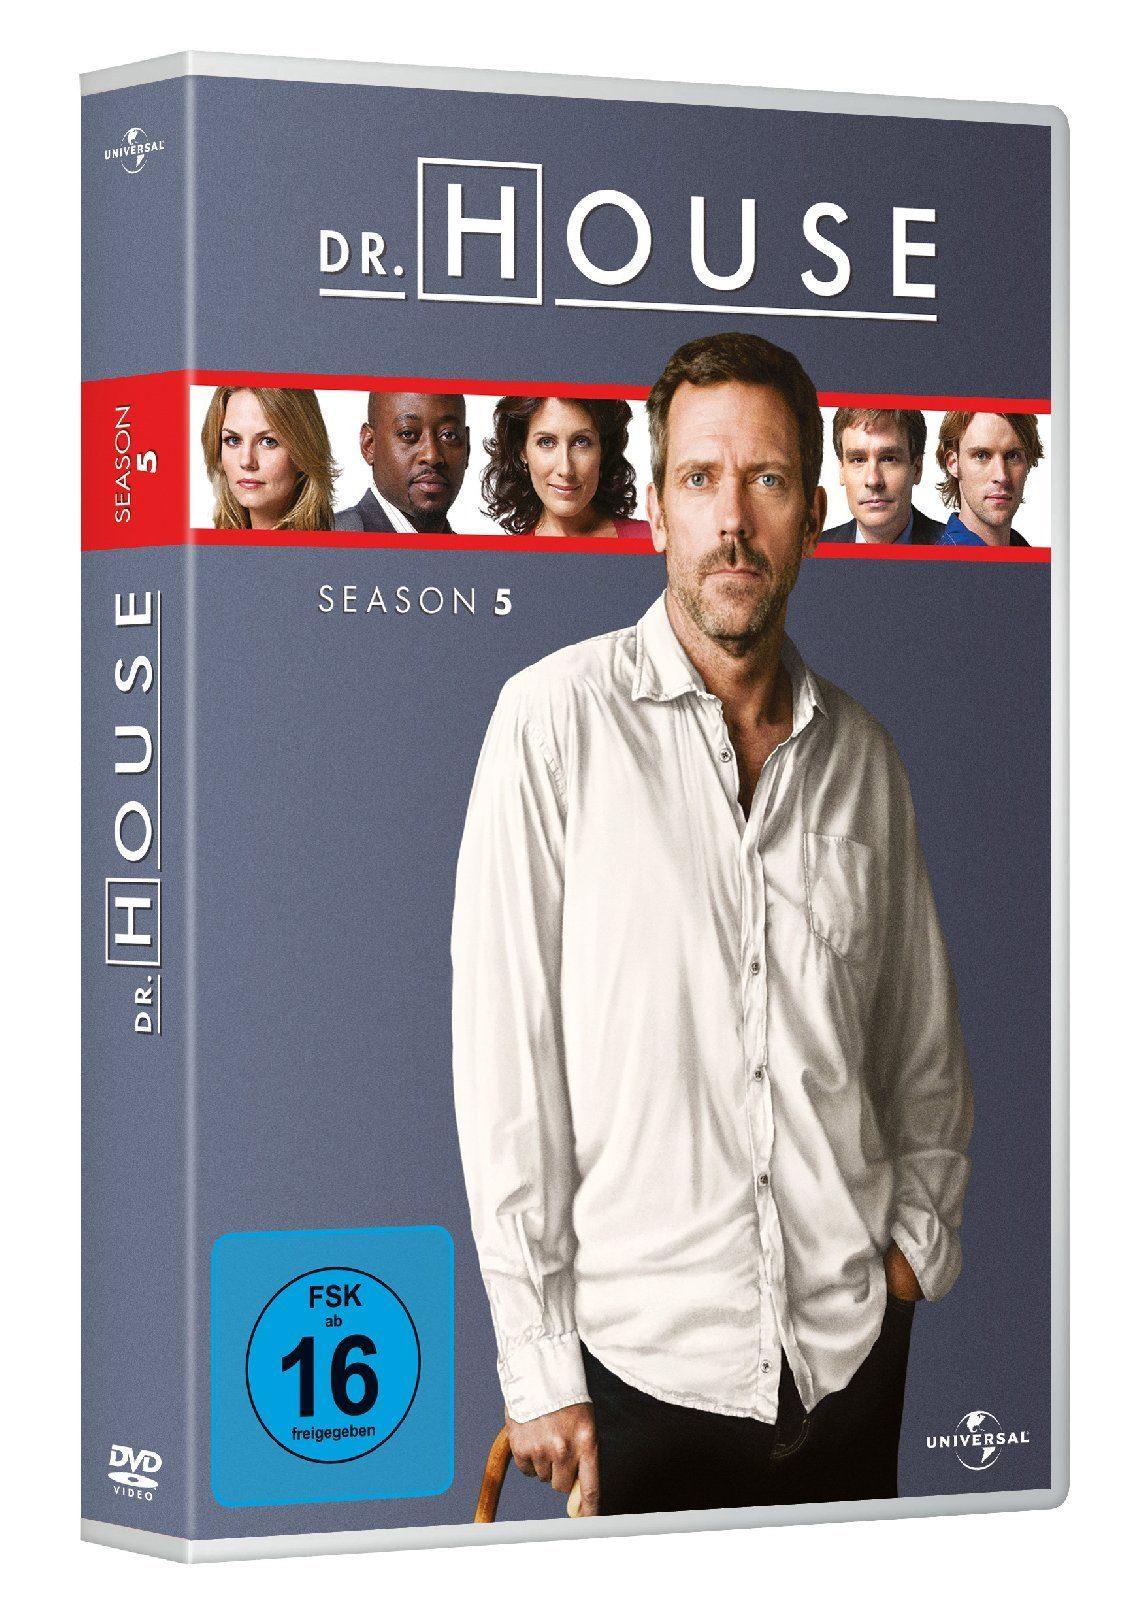 Universal Dr. House - Season 5 »DVD«